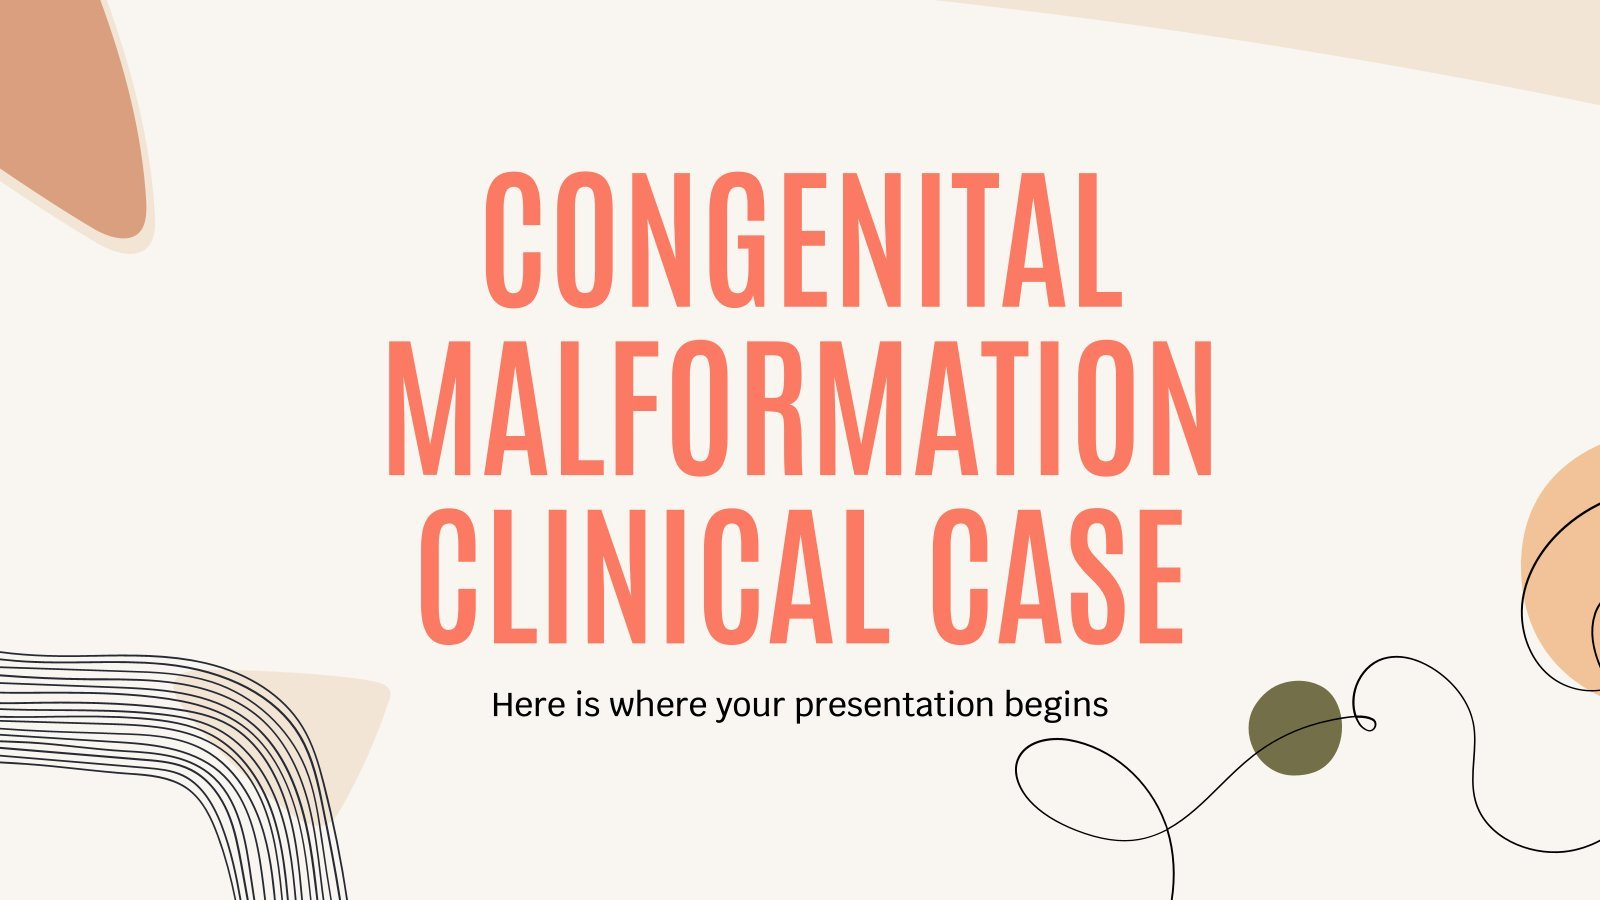 Congenital Malformation Clinical Case presentation template